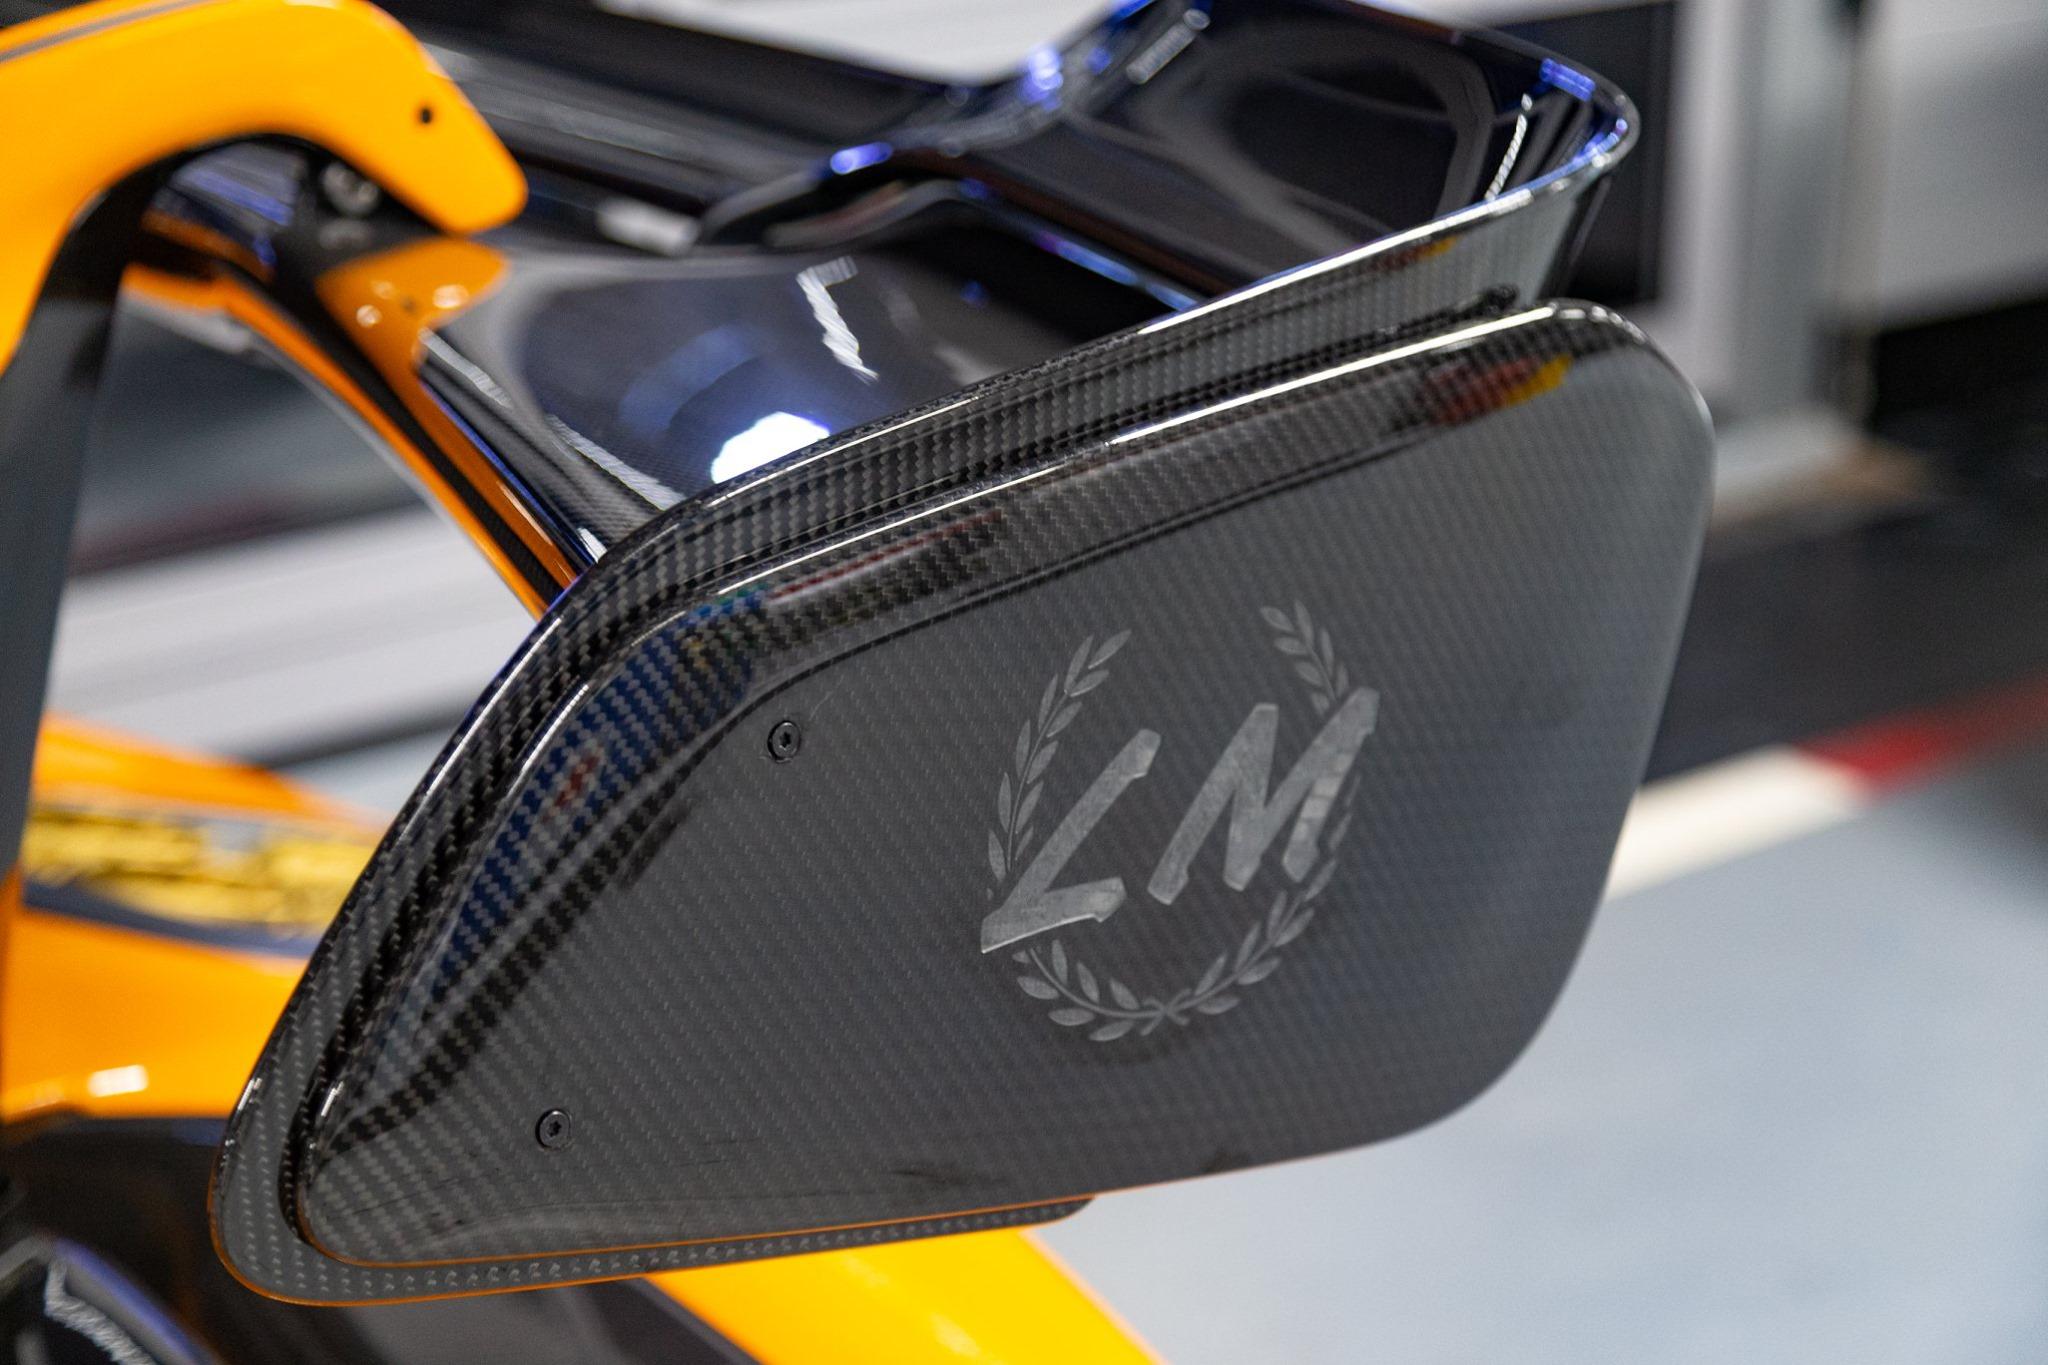 Adrian_Sutil_McLaren_Senna_LM_crash_0005